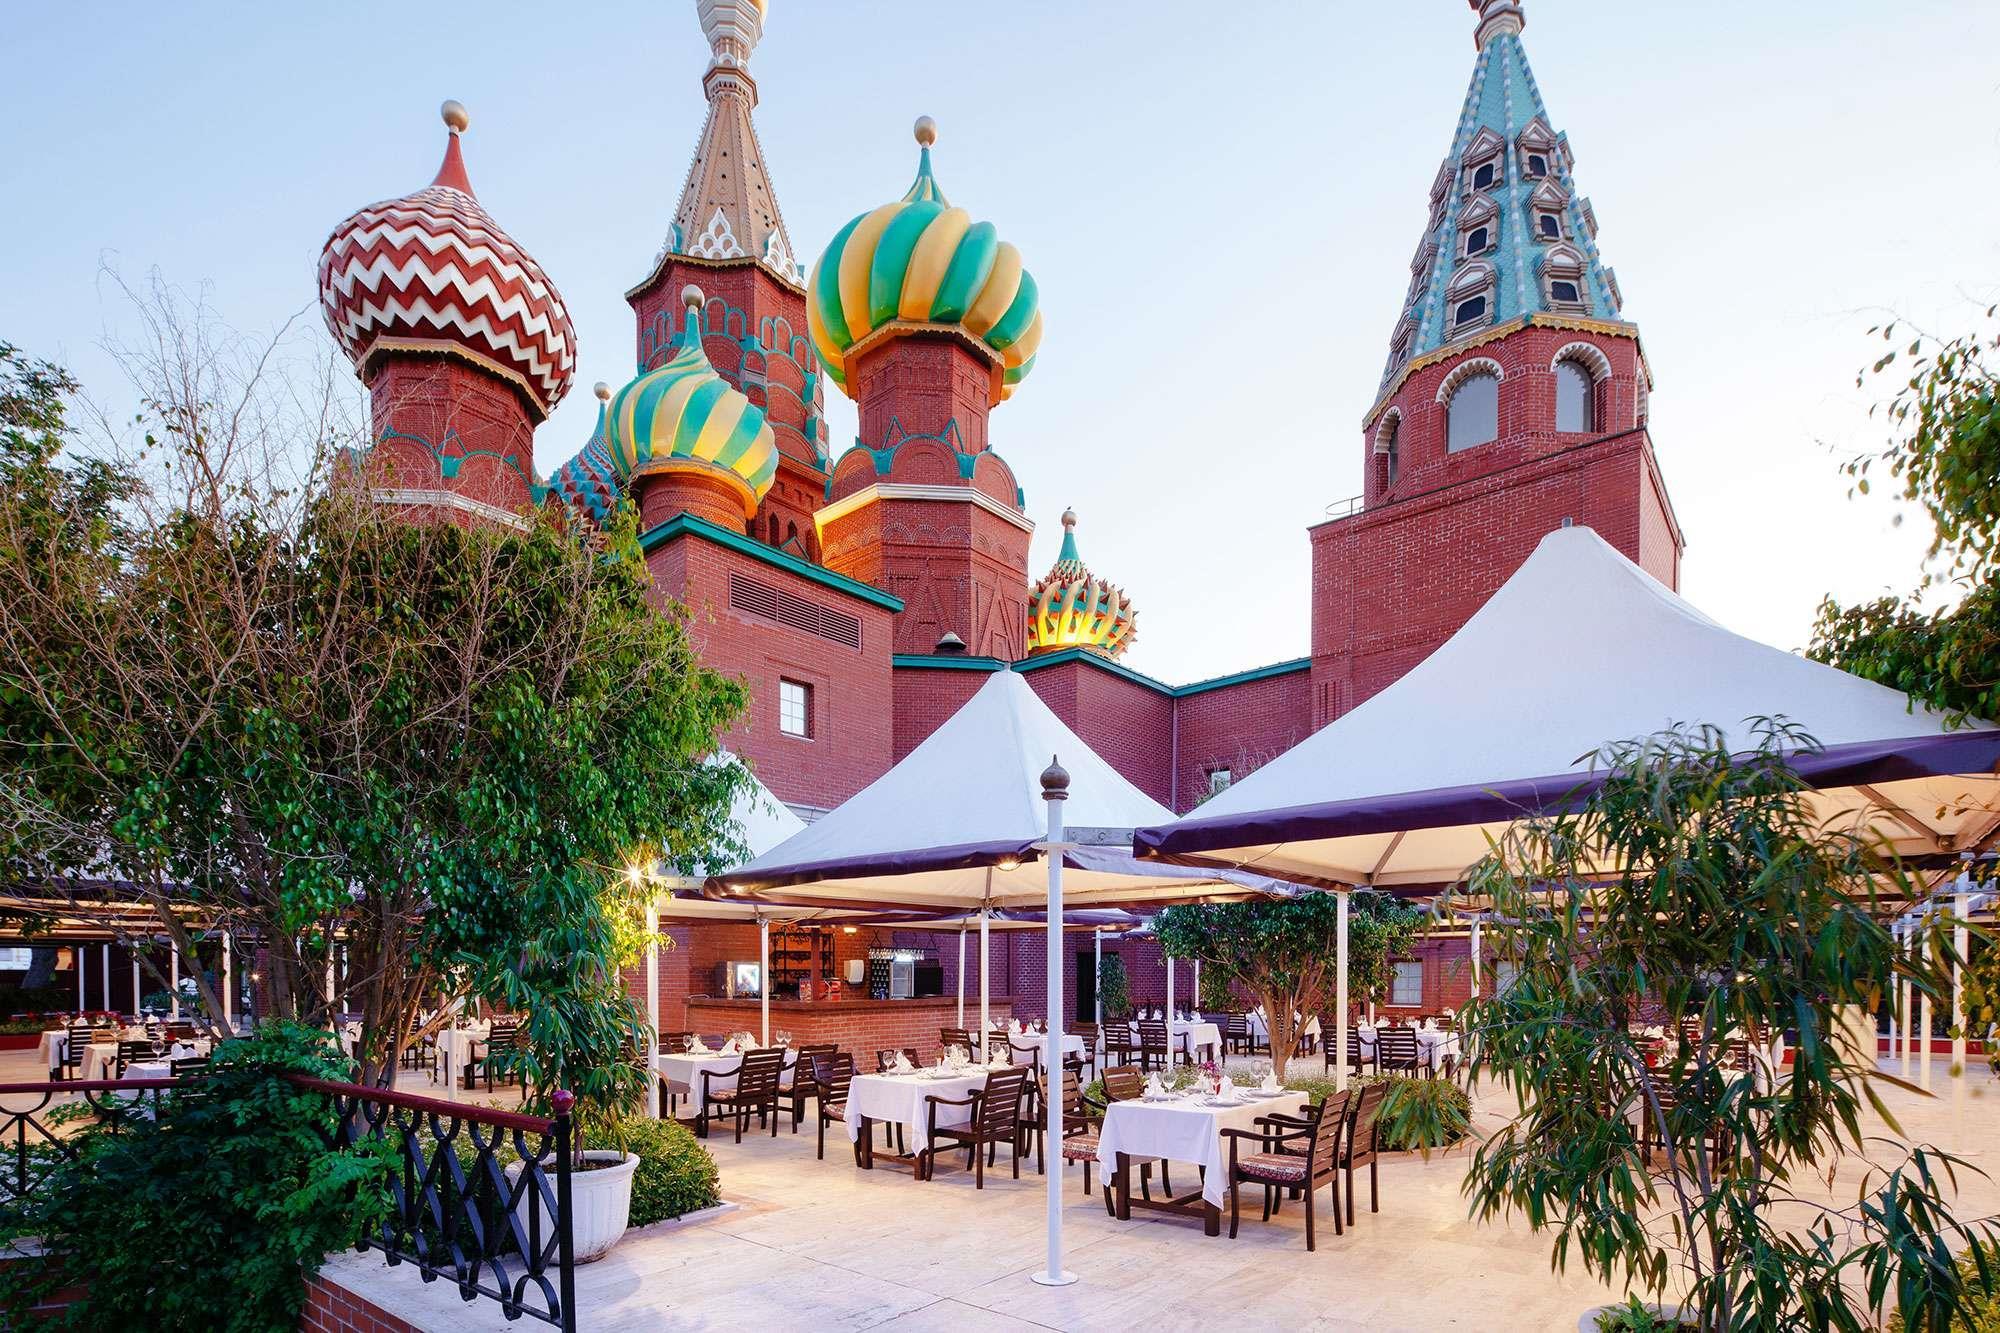 asteria-kremlin-palace-ex-pgs-kremlin-palace-genel-009